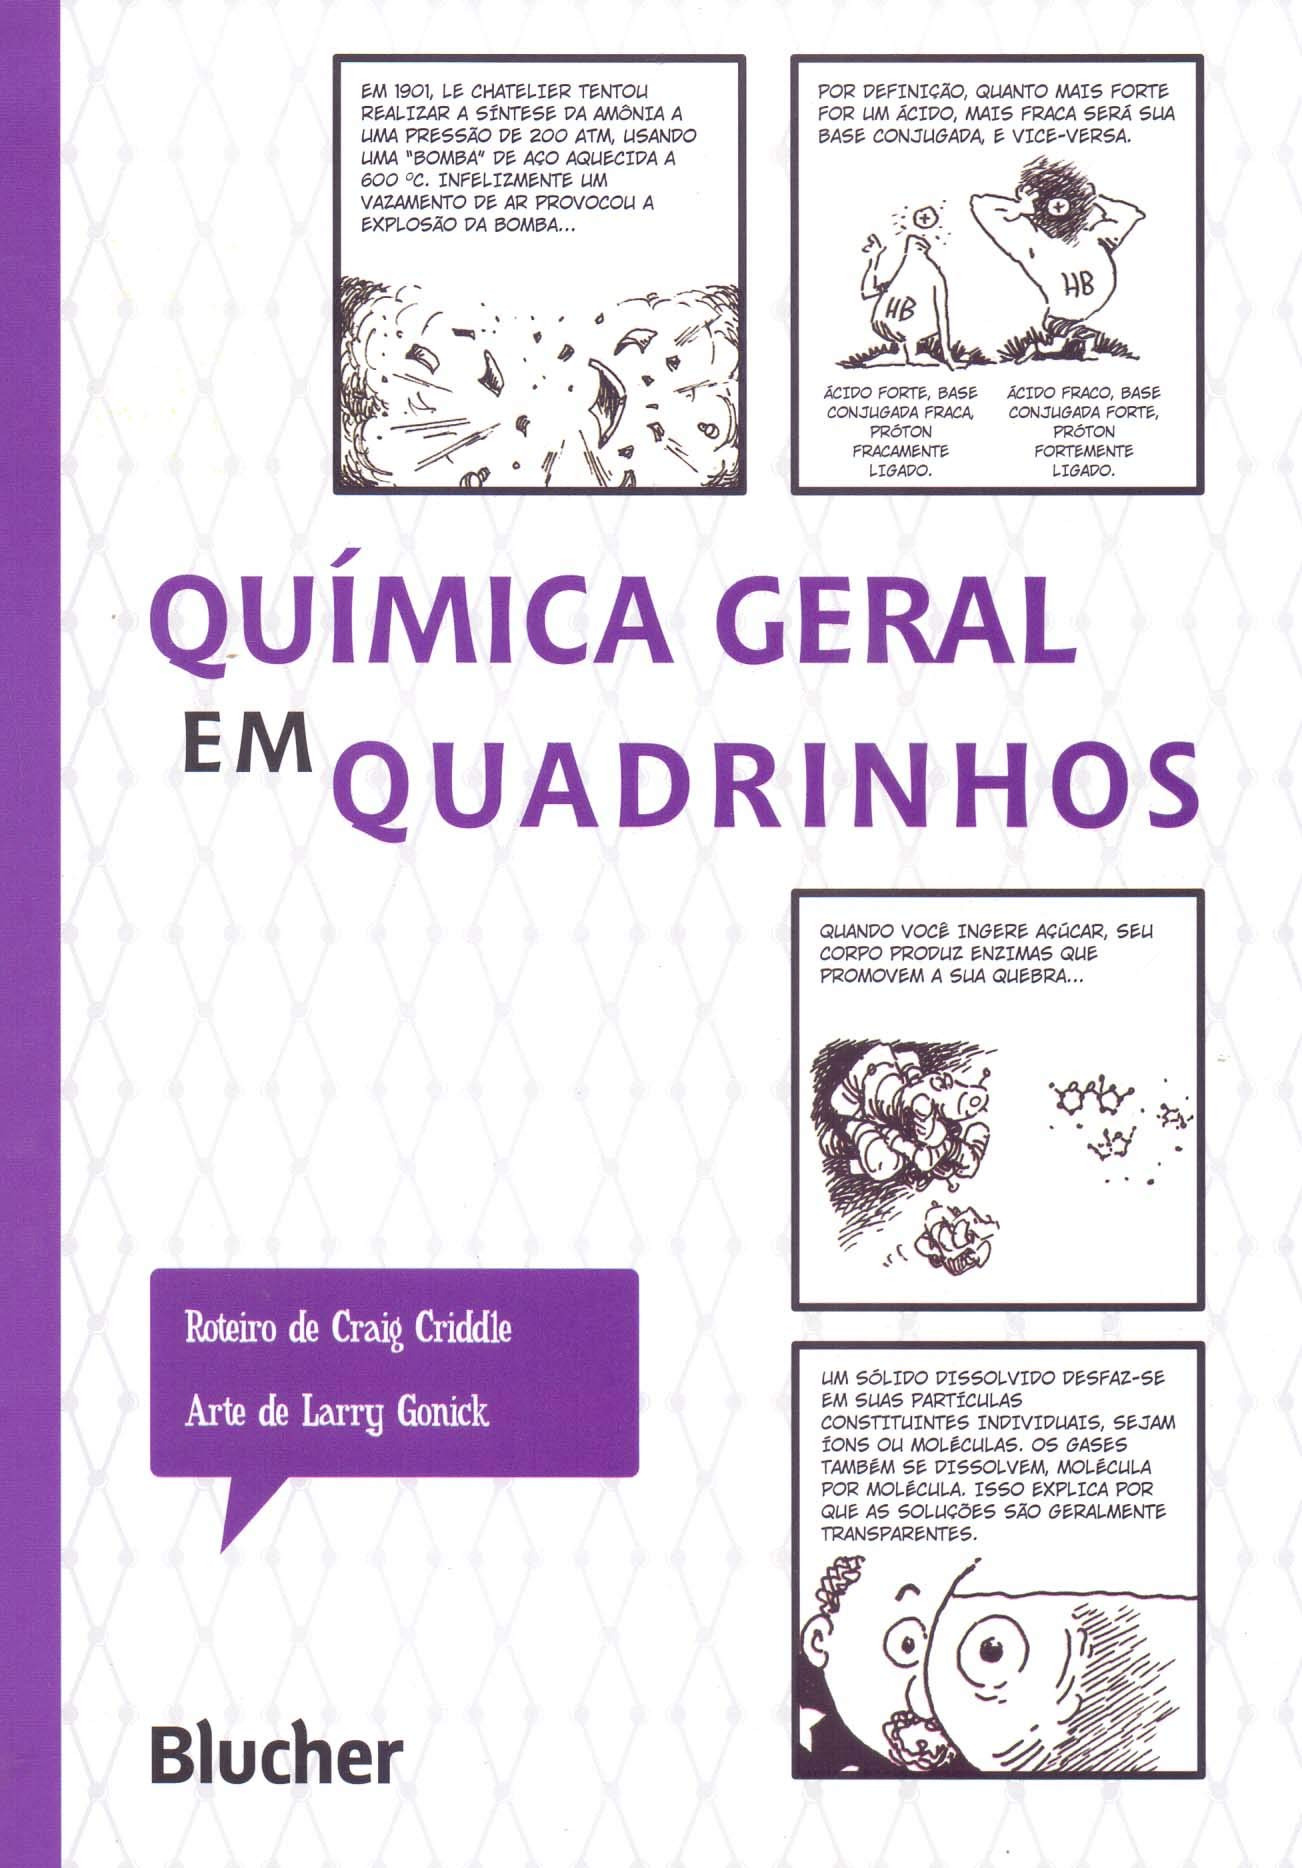 Quimica Geral em Quadrinhos: Gonick/Criddle: 9788521207764 ...